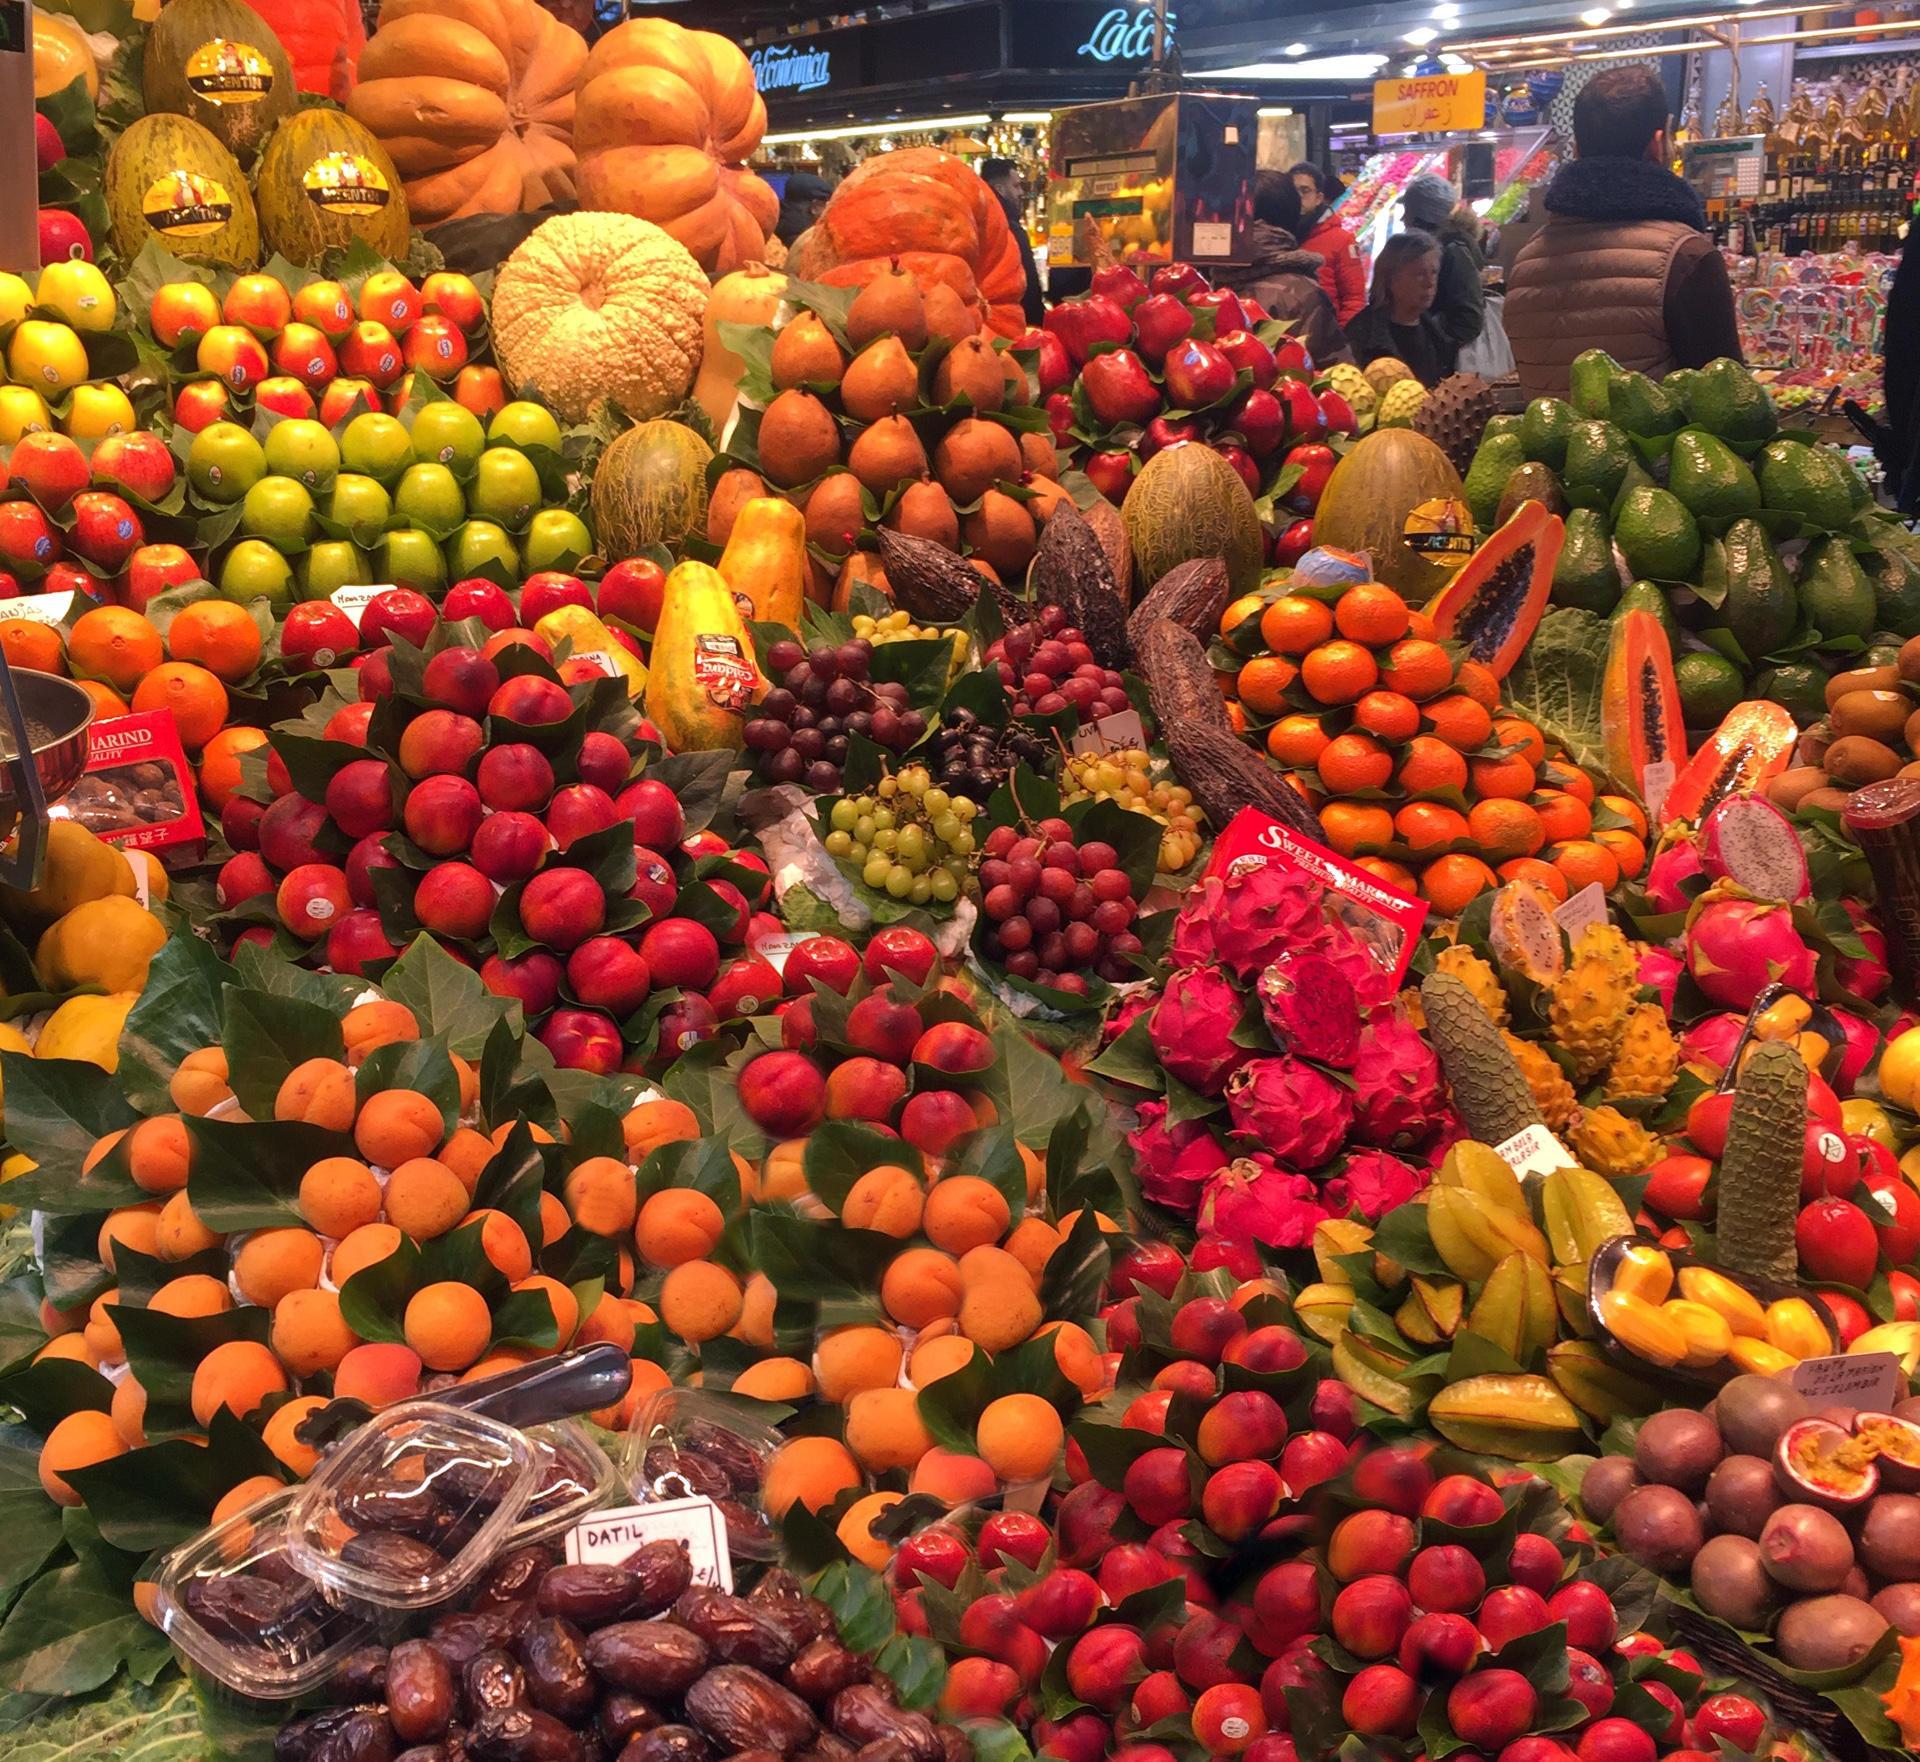 barcelona targ miejski la boqueria owoce iglawpodrozy